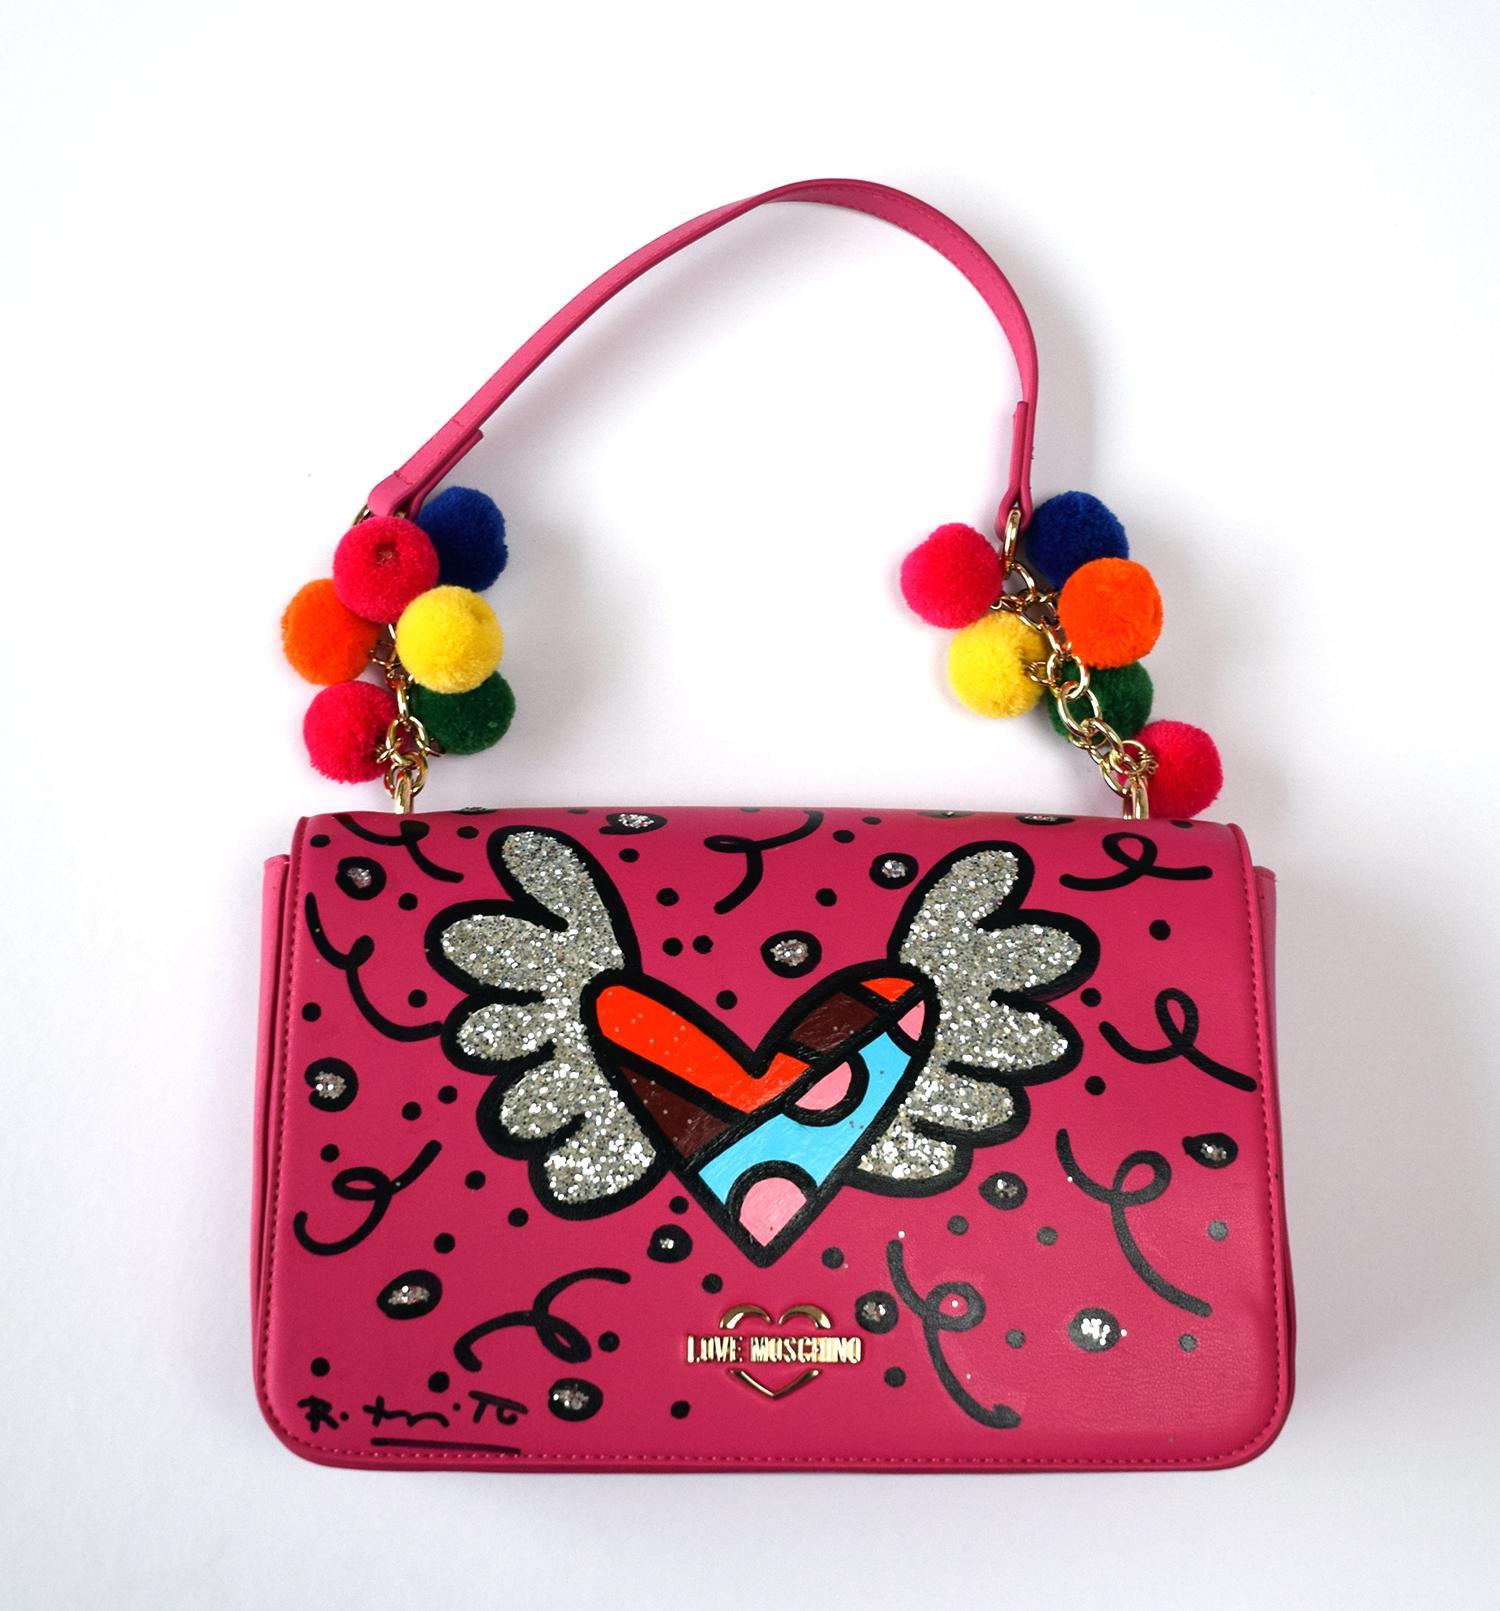 "Romero Britto - Handtasche Love Moschino ""Heart"" , 5603-011-003"